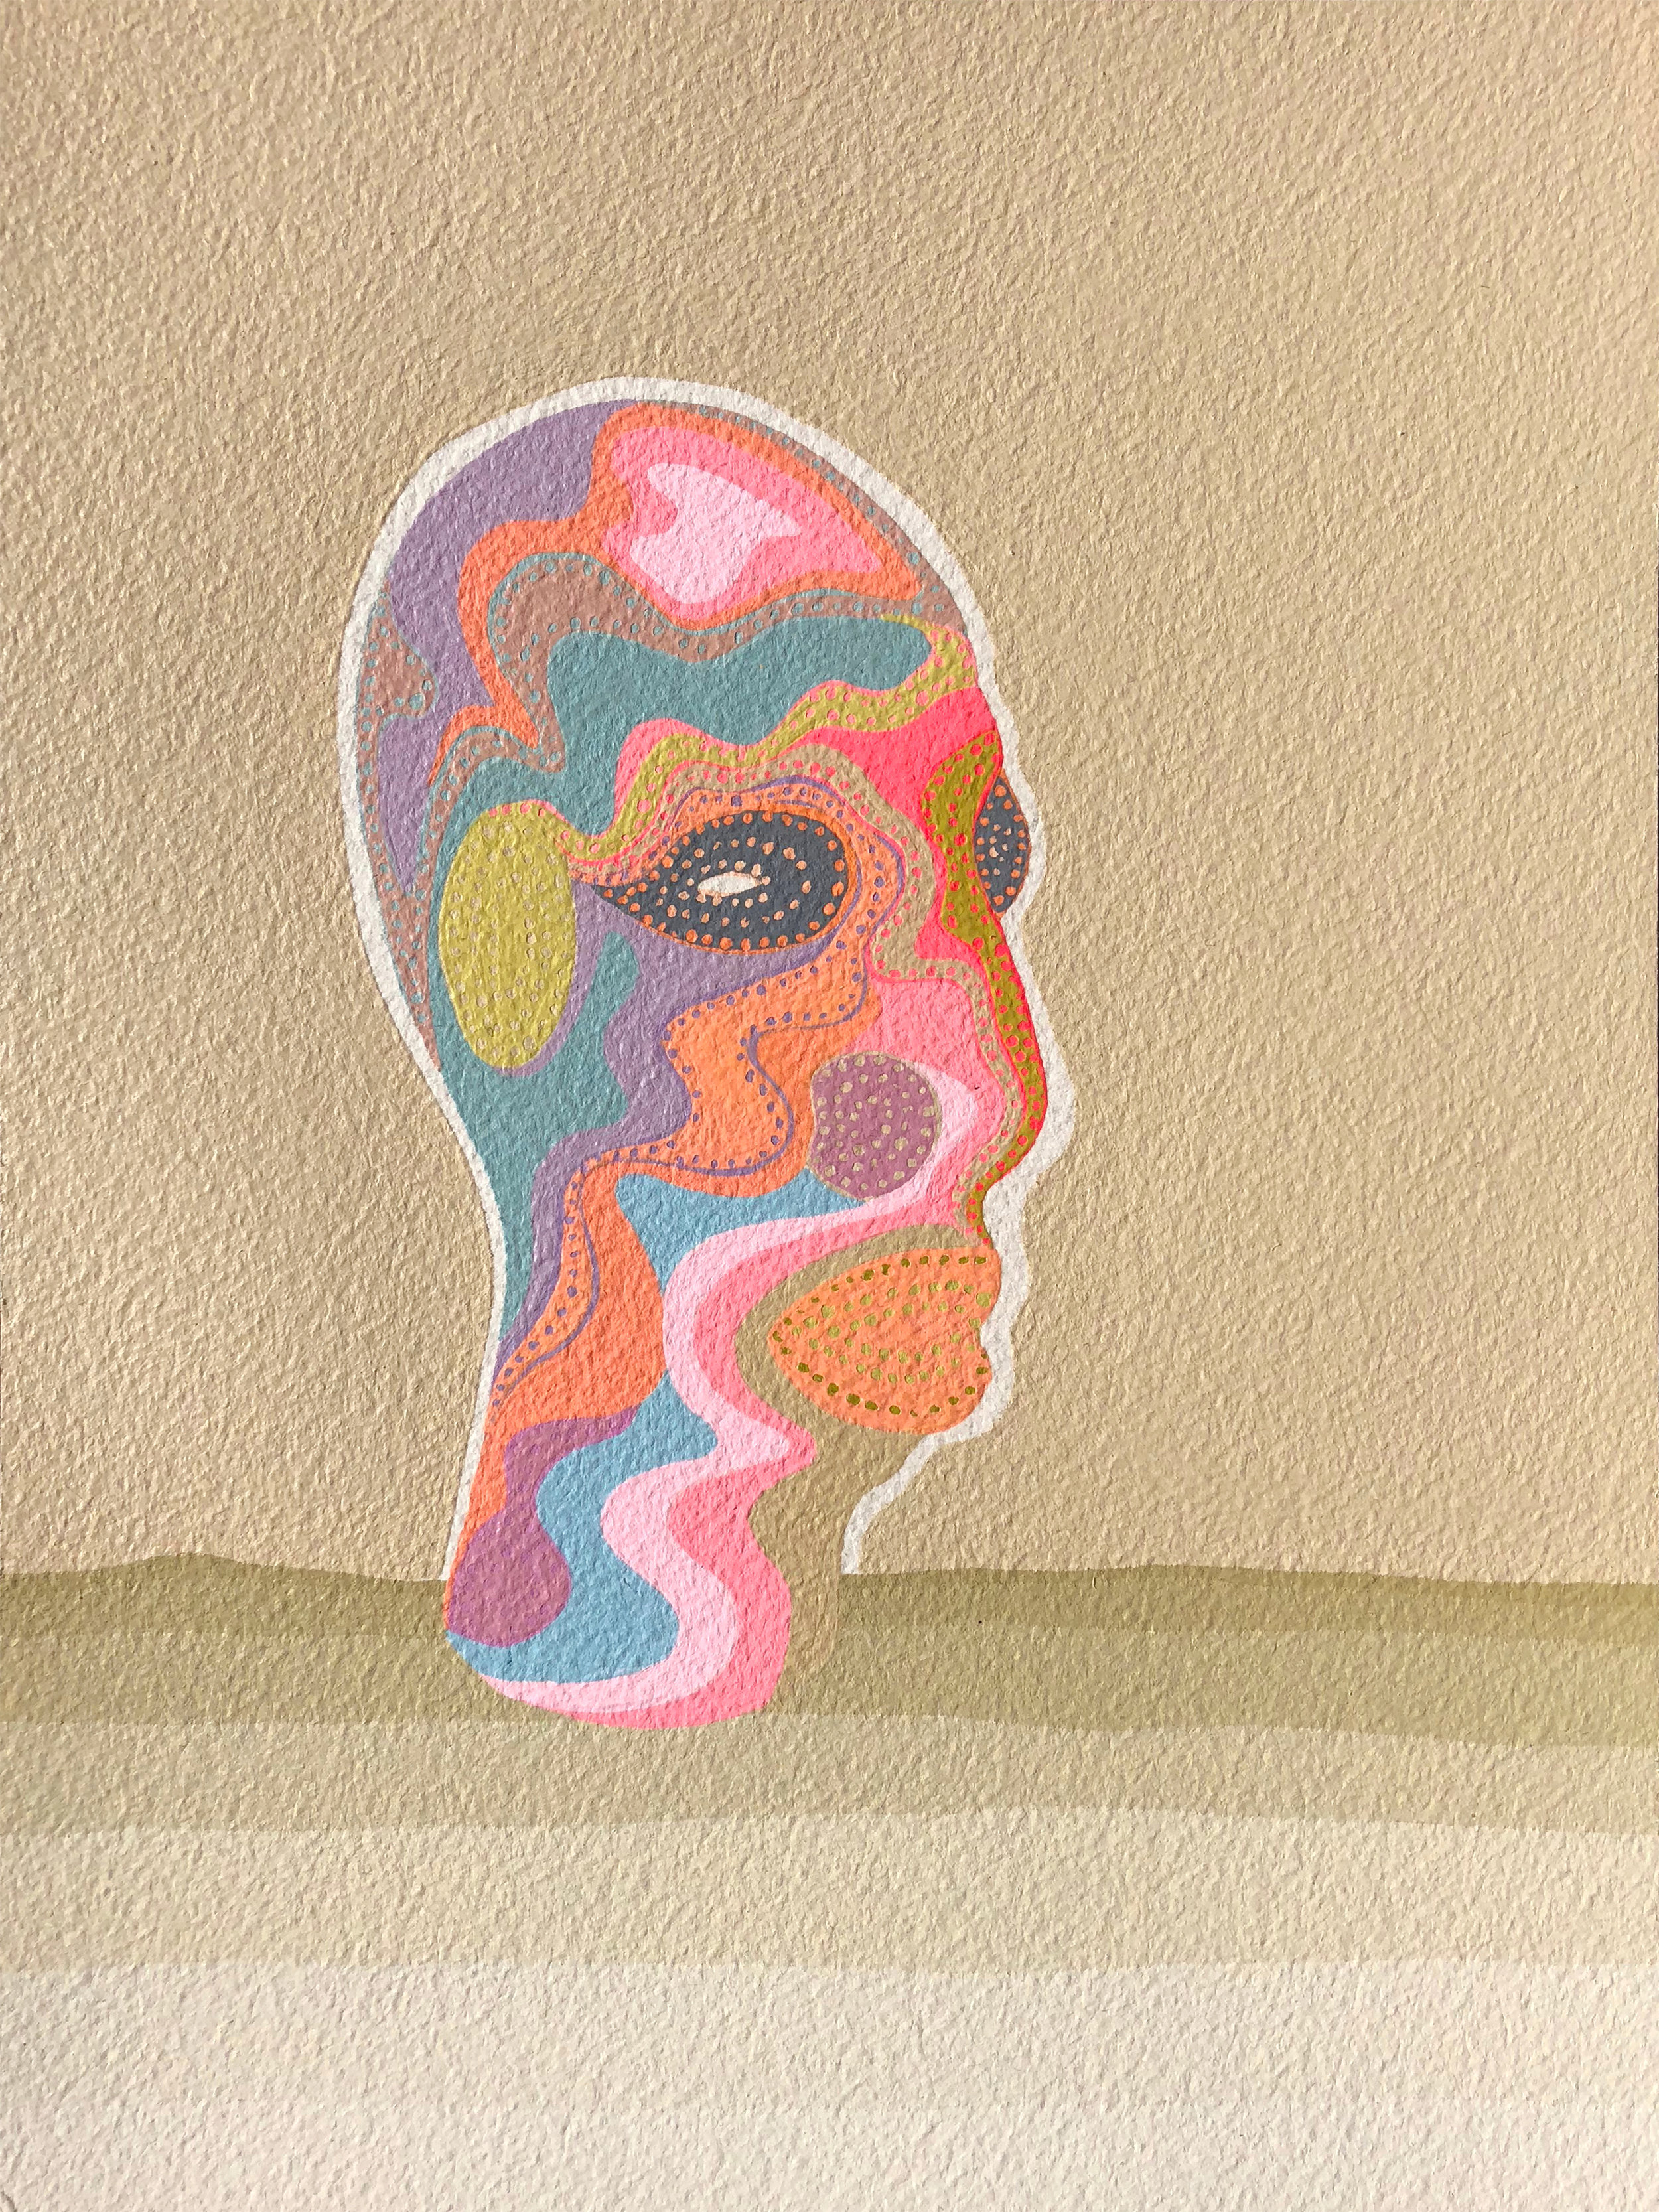 hypercolour head IV